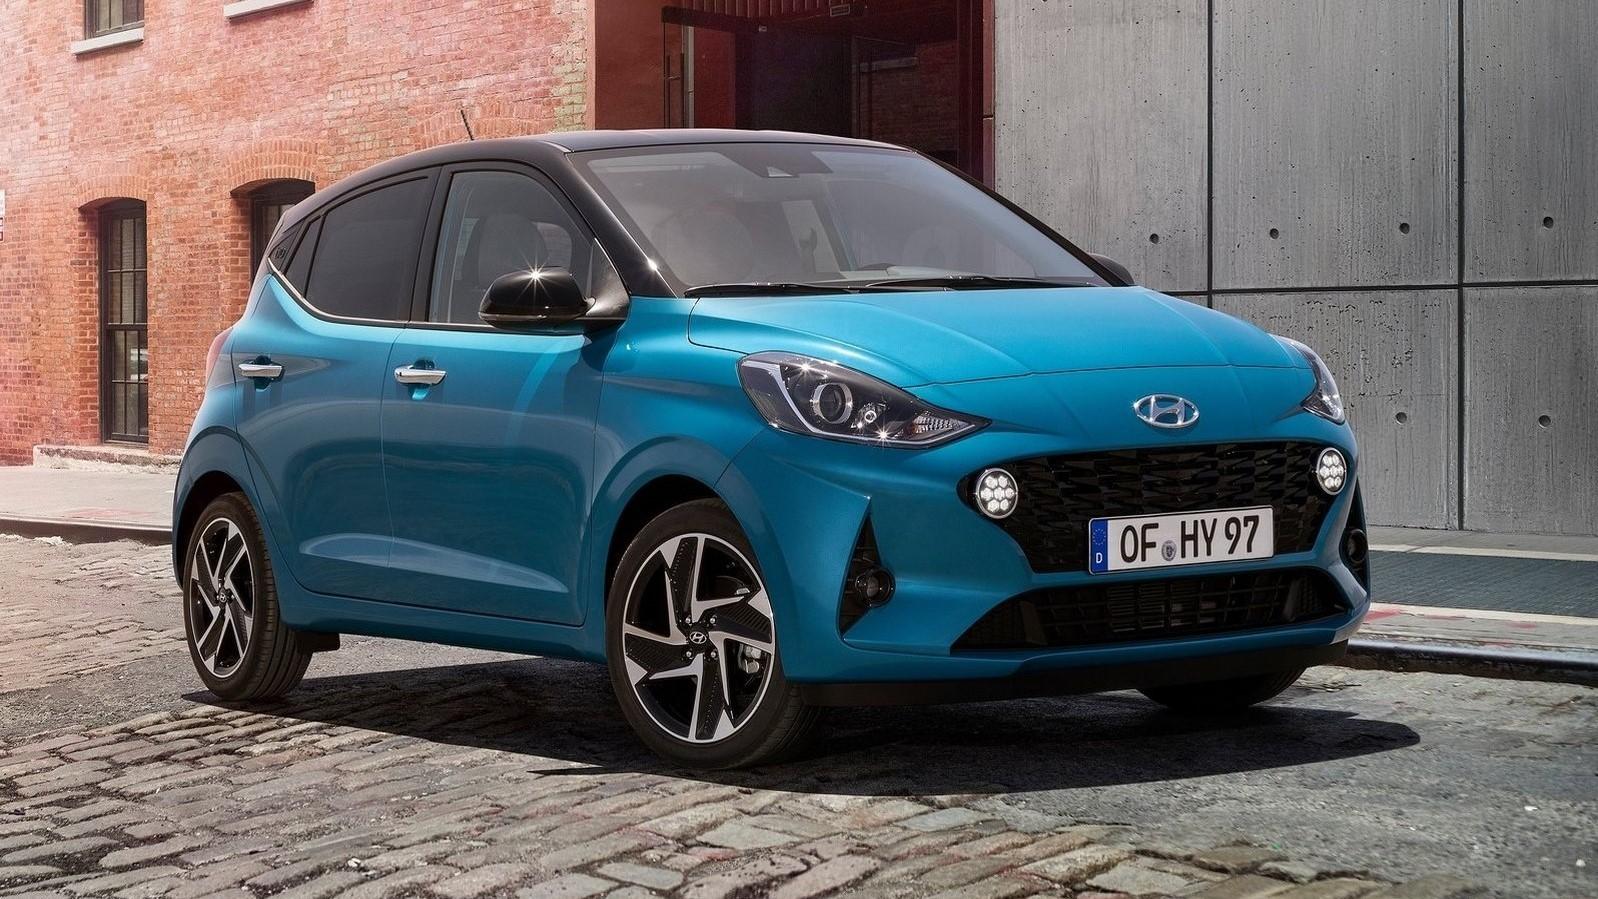 Hyundai i10 2020 – Un design original, moderne, audacieux et expressif